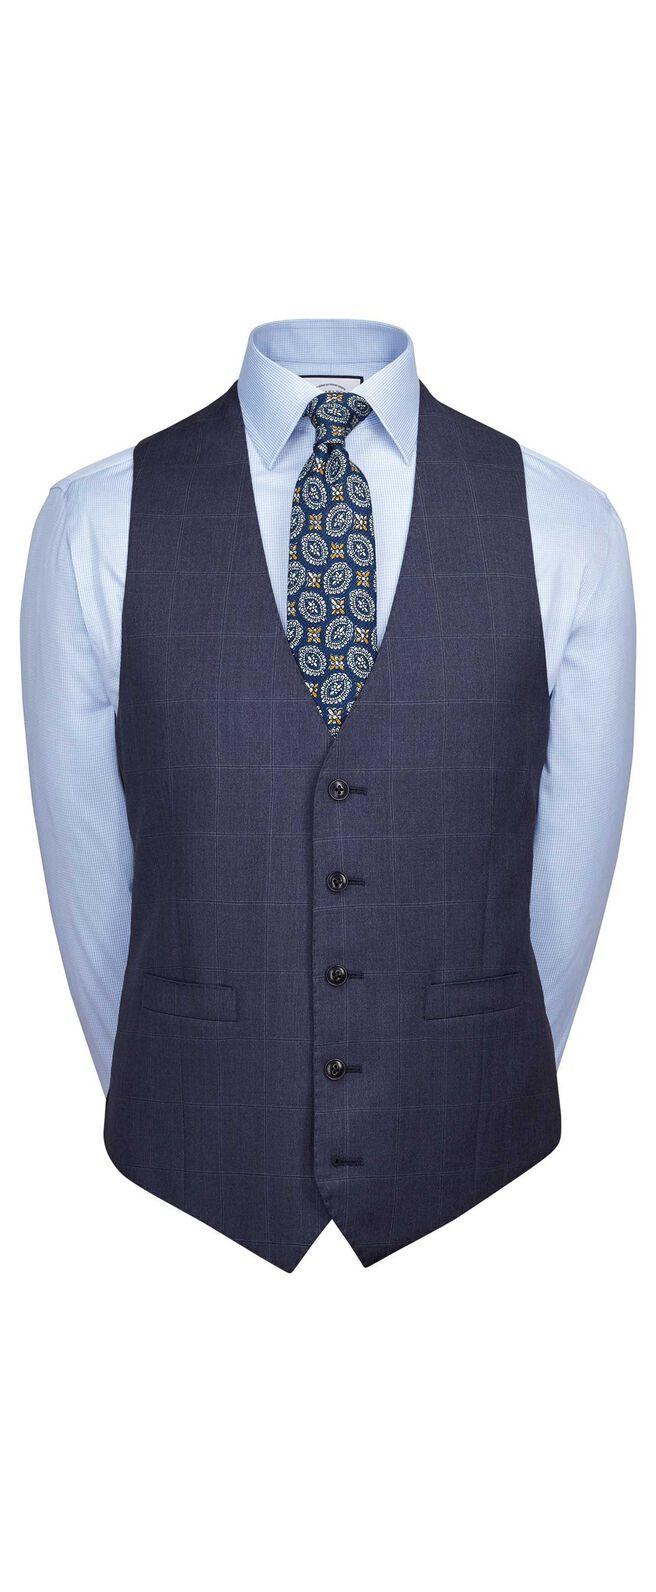 Airforce blue slim fit Italian suit